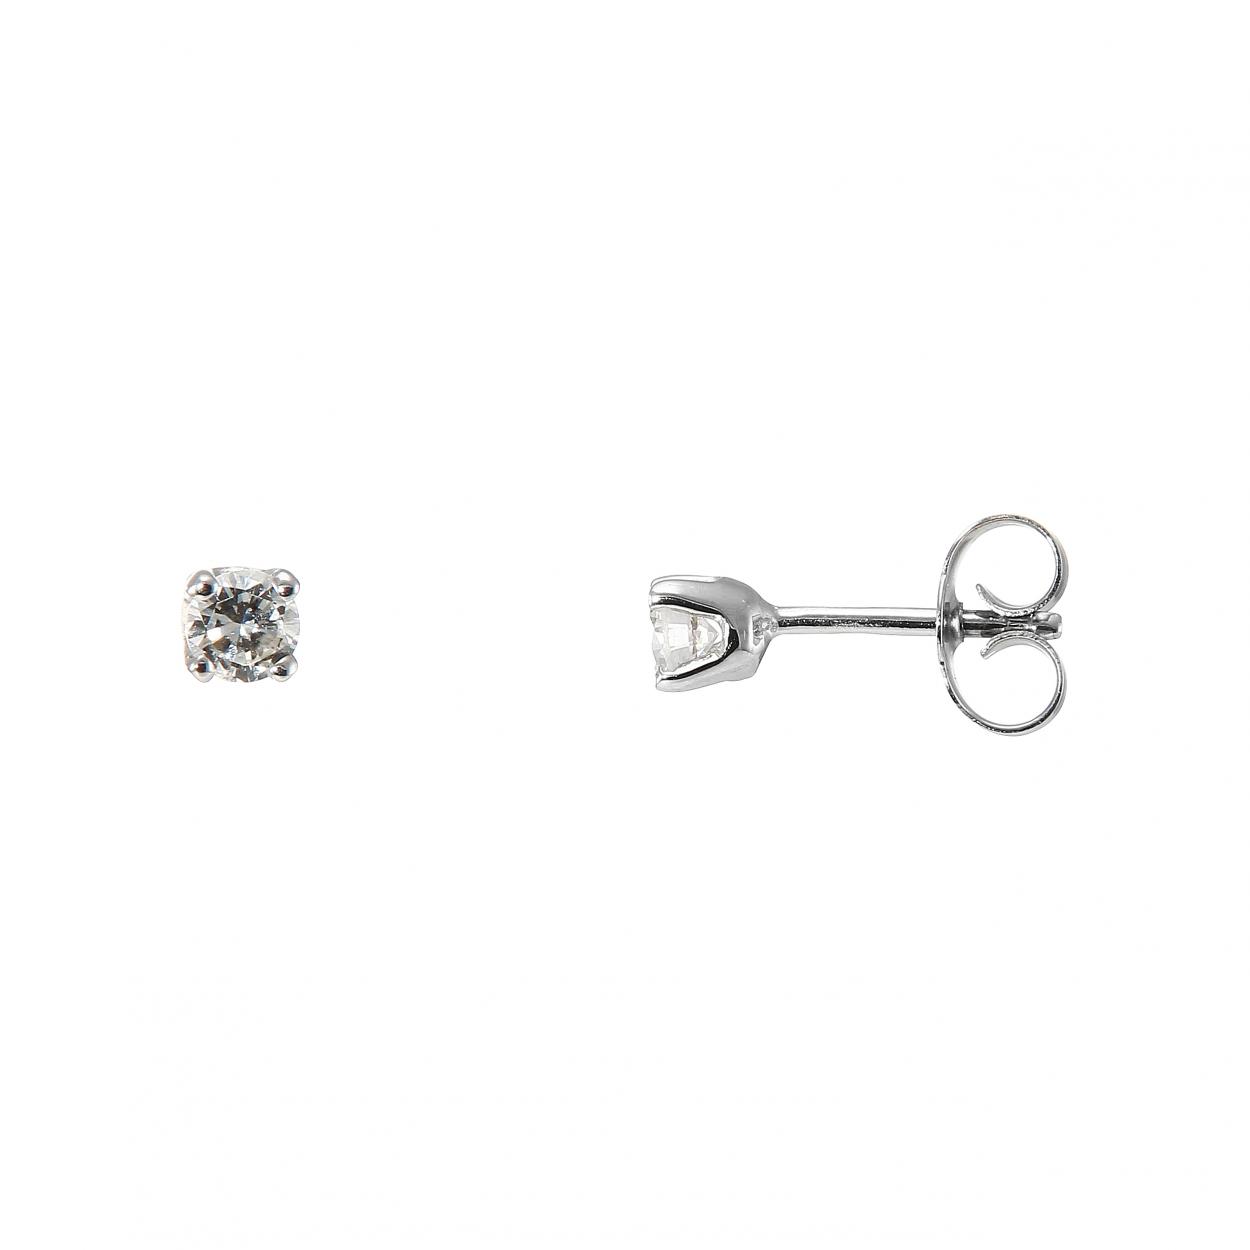 boucles d 39 oreilles diamant ct hsi or blanc ref 32150. Black Bedroom Furniture Sets. Home Design Ideas